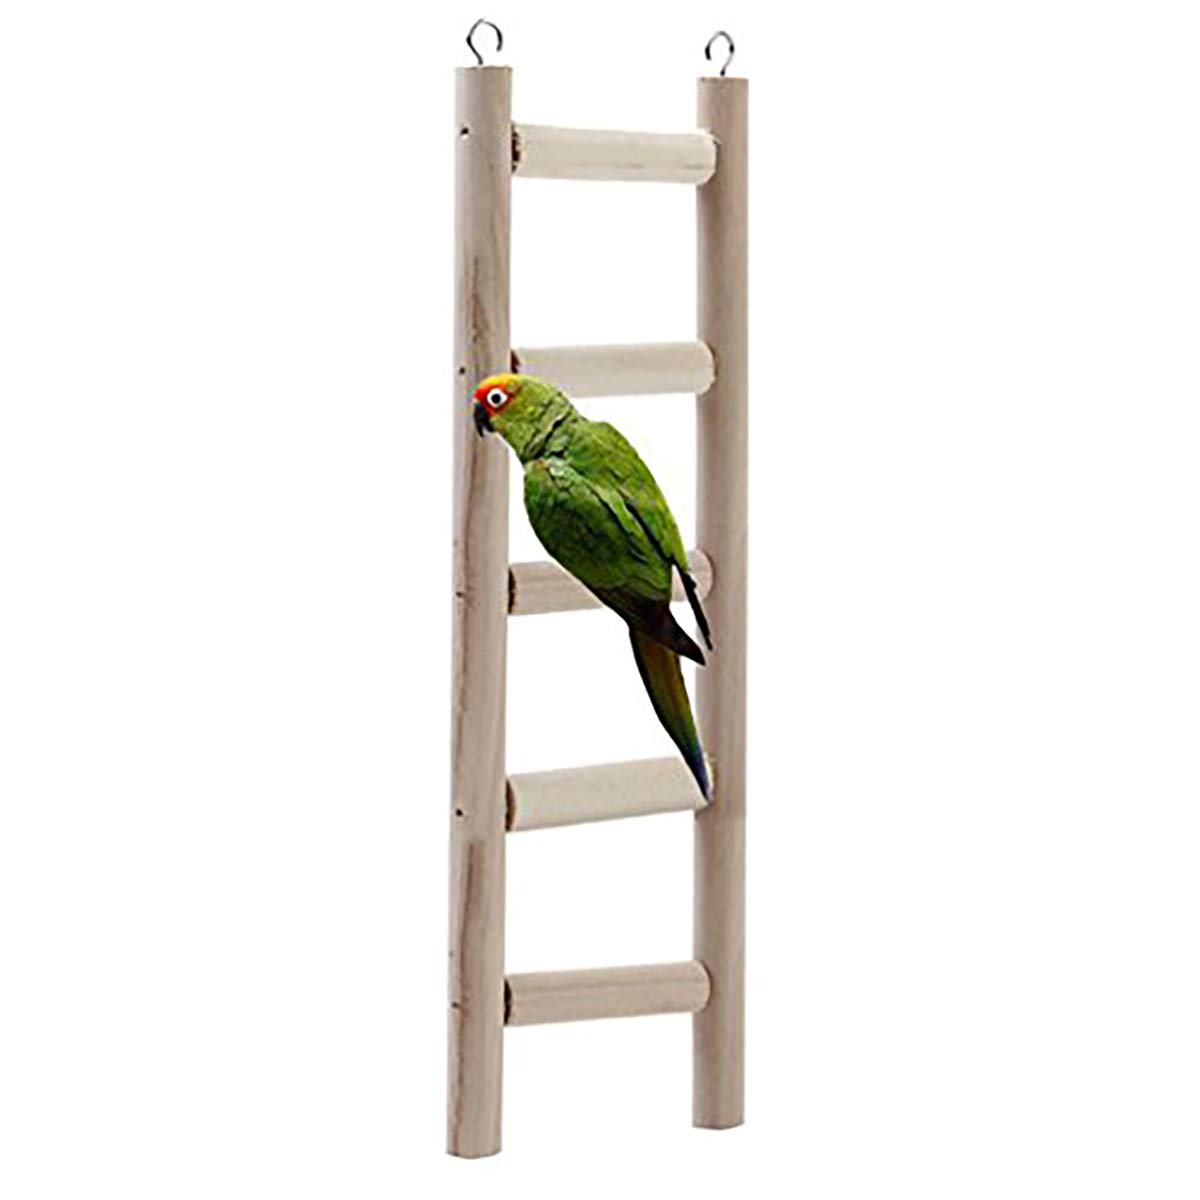 MINI CUTE Pájaro Stand Perch con Espejo para Parrot Periquito Cockatiels Finch Lovebird África Gris Macaw  Cockatoo Jaula Juguete de Madera